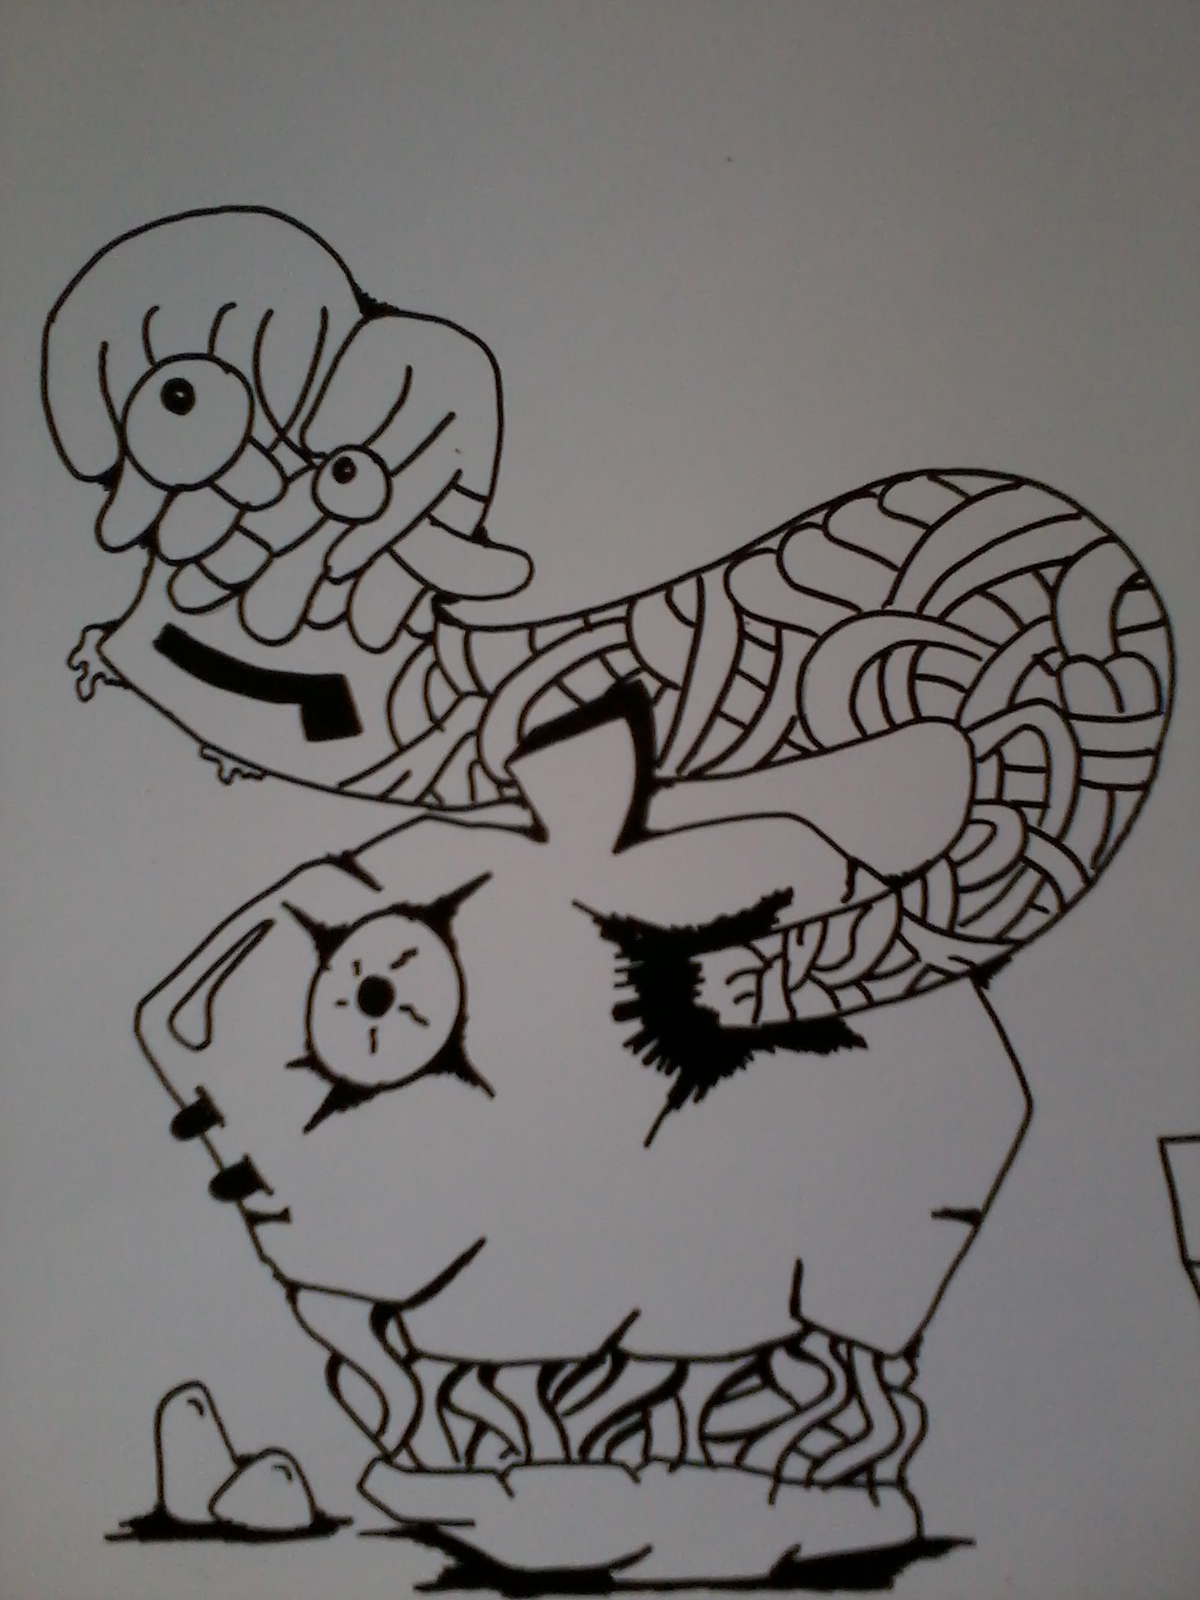 Kumpulan Sketsa Gambar Monster